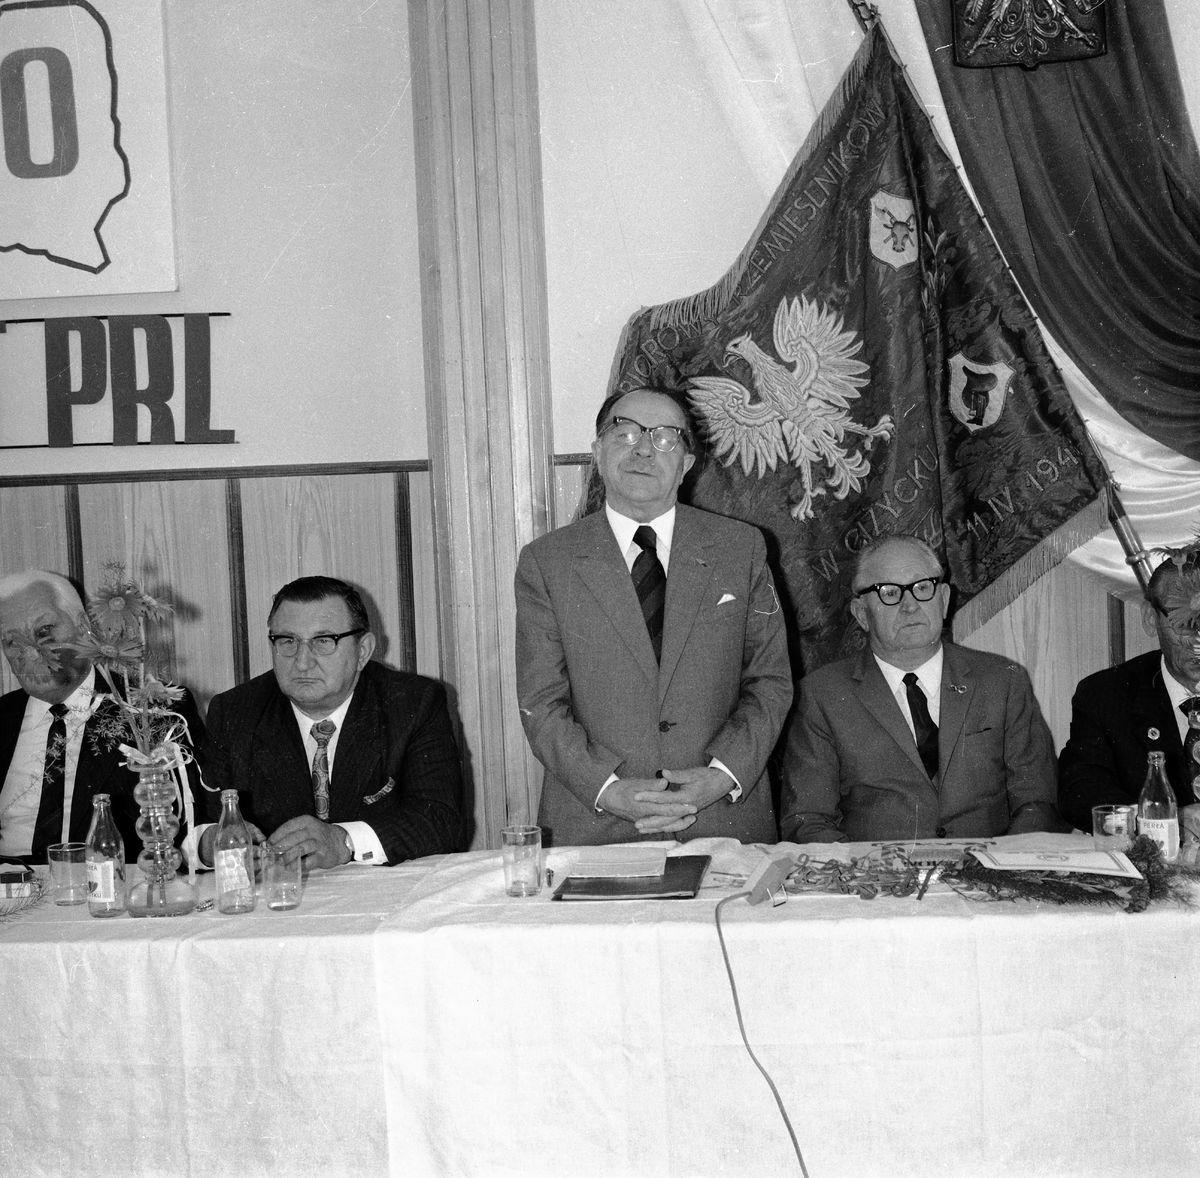 Spotkanie z okazji 30-lecia PRL, 1974 r.